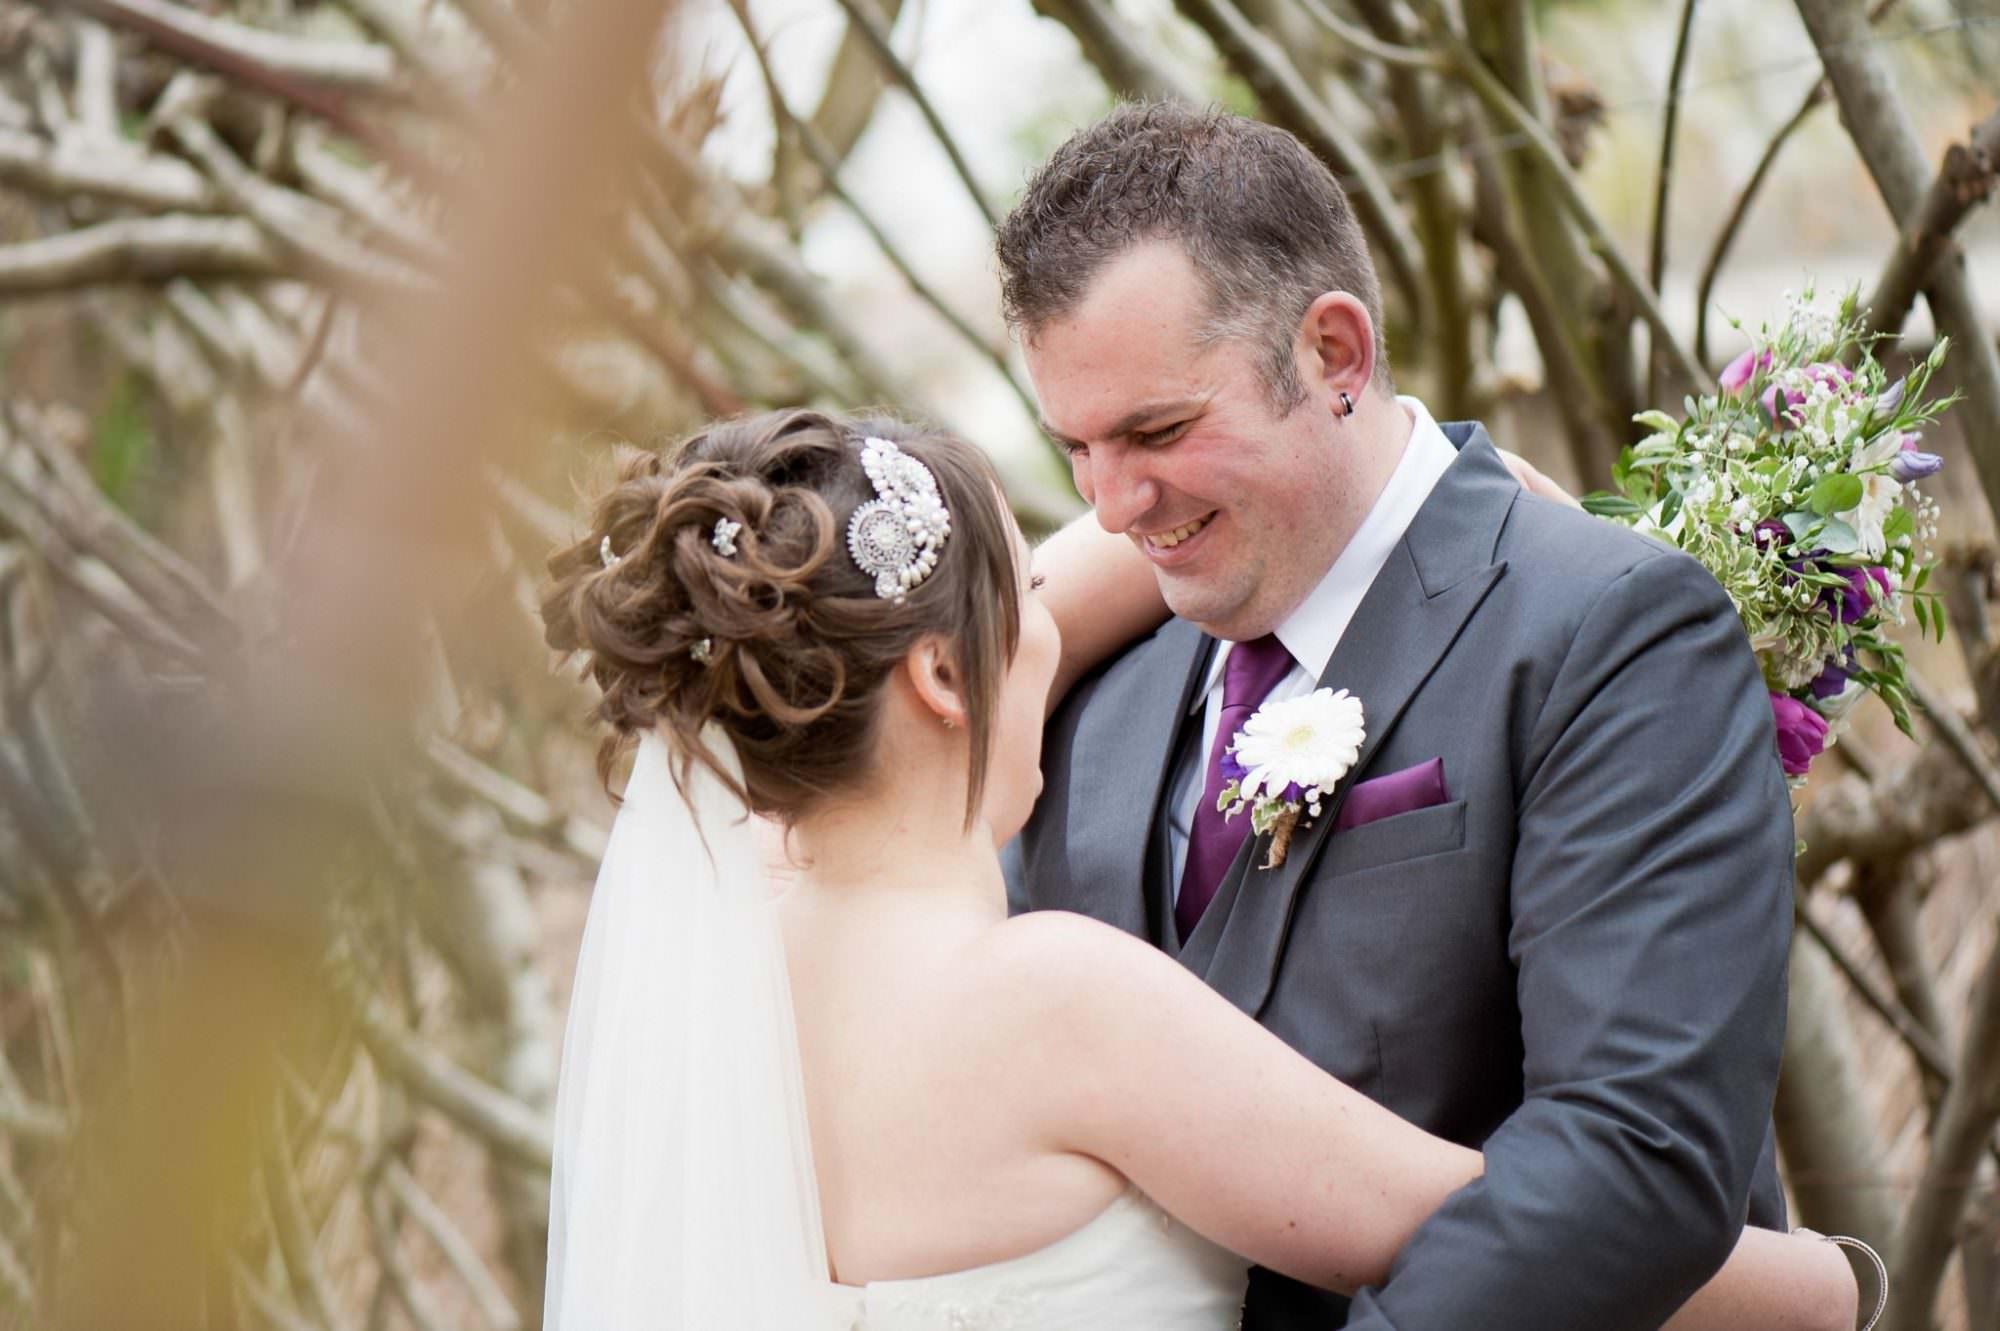 Groom at Christchurch Wedding